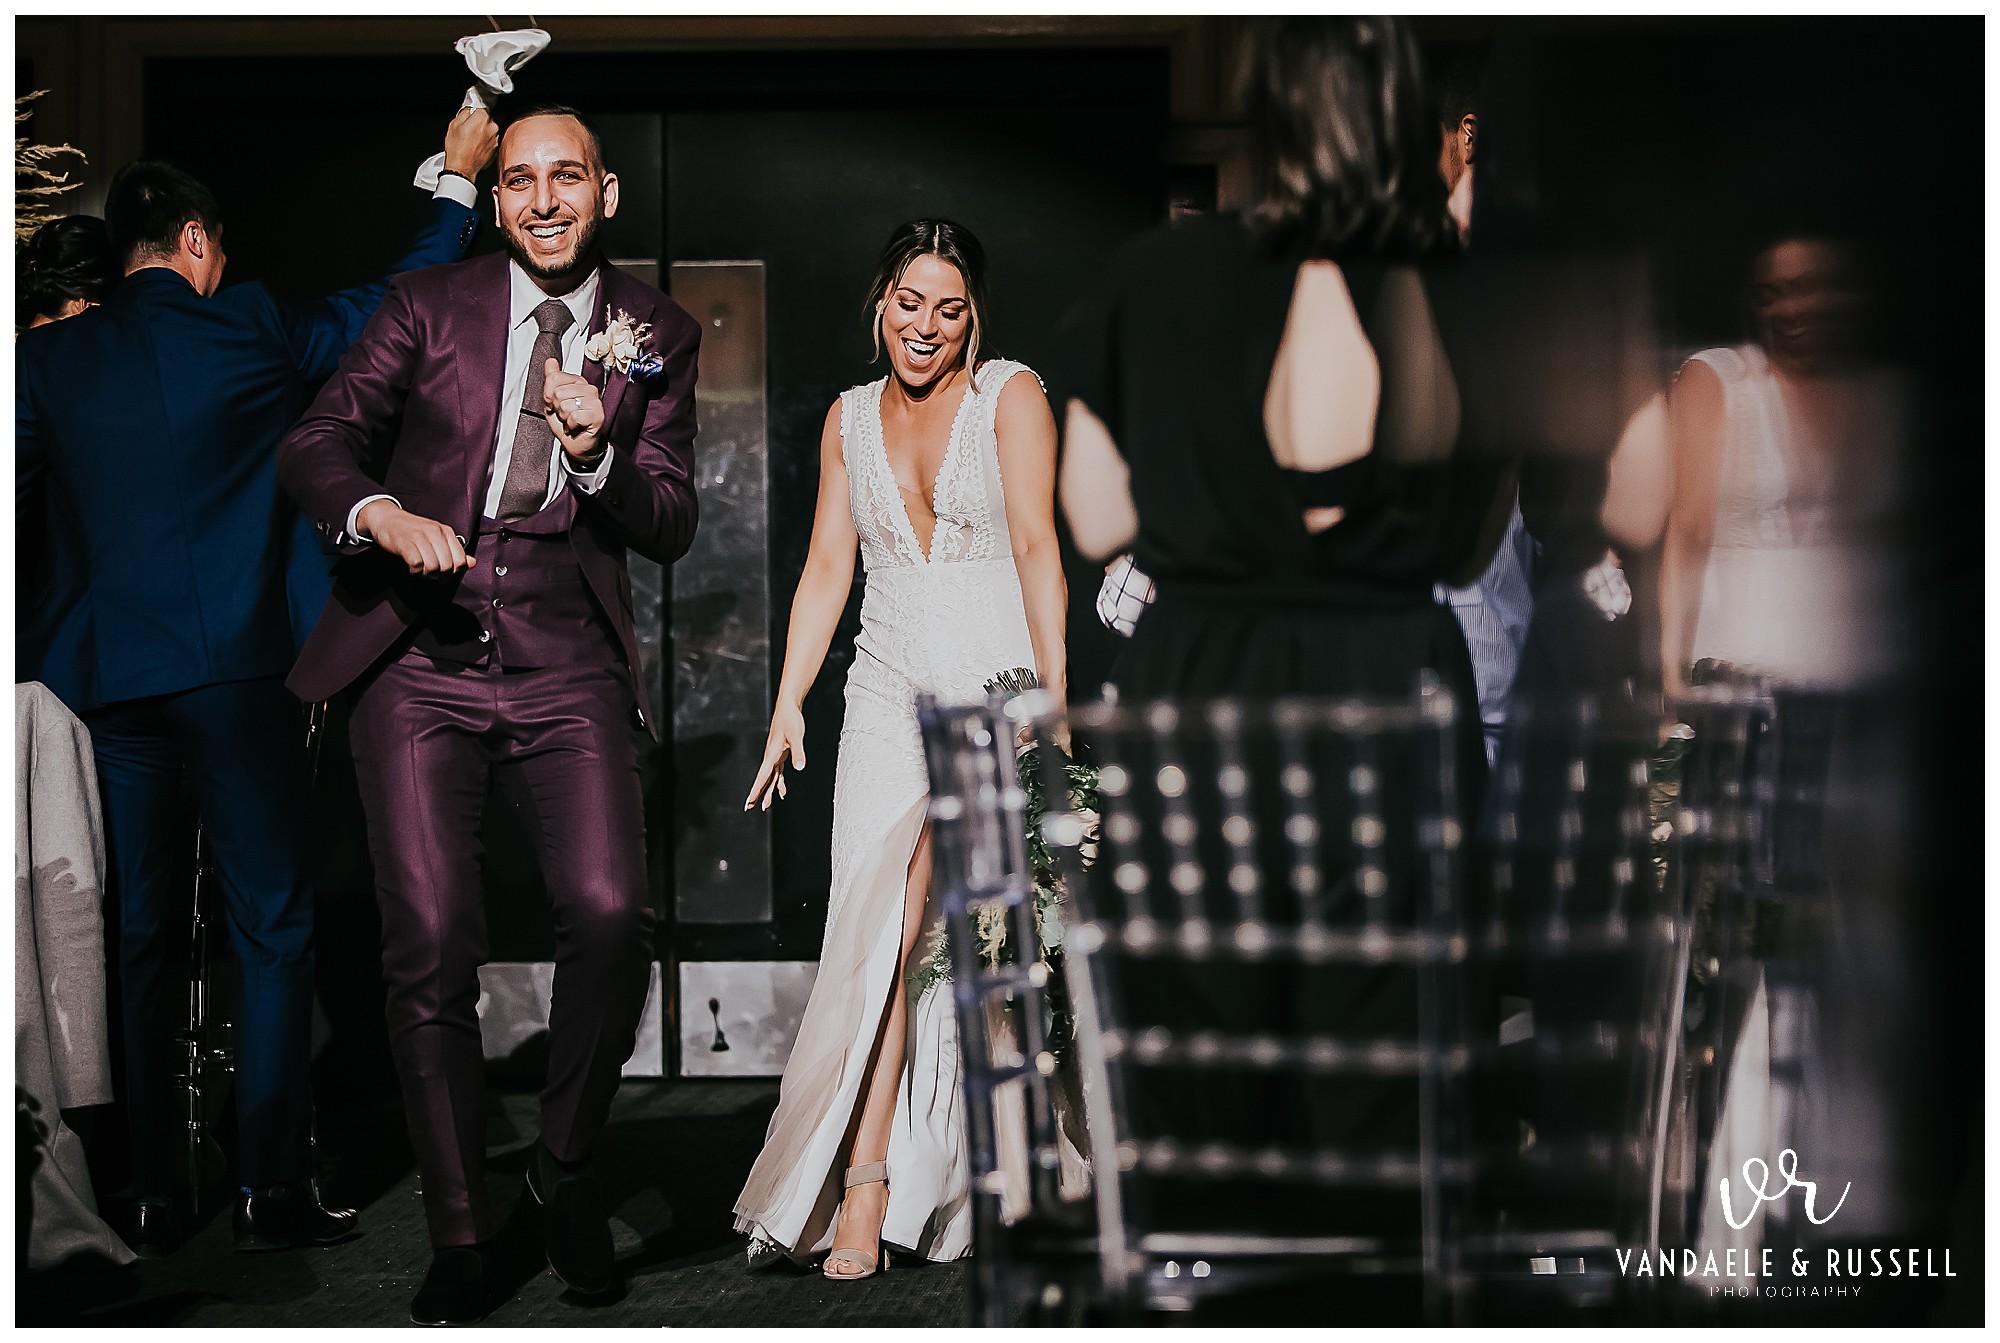 Joanna-Christos-Grand-Luxe-Wedding-Photos-Mint-Room-Toronto-VanDaele-Russell_0099.jpg